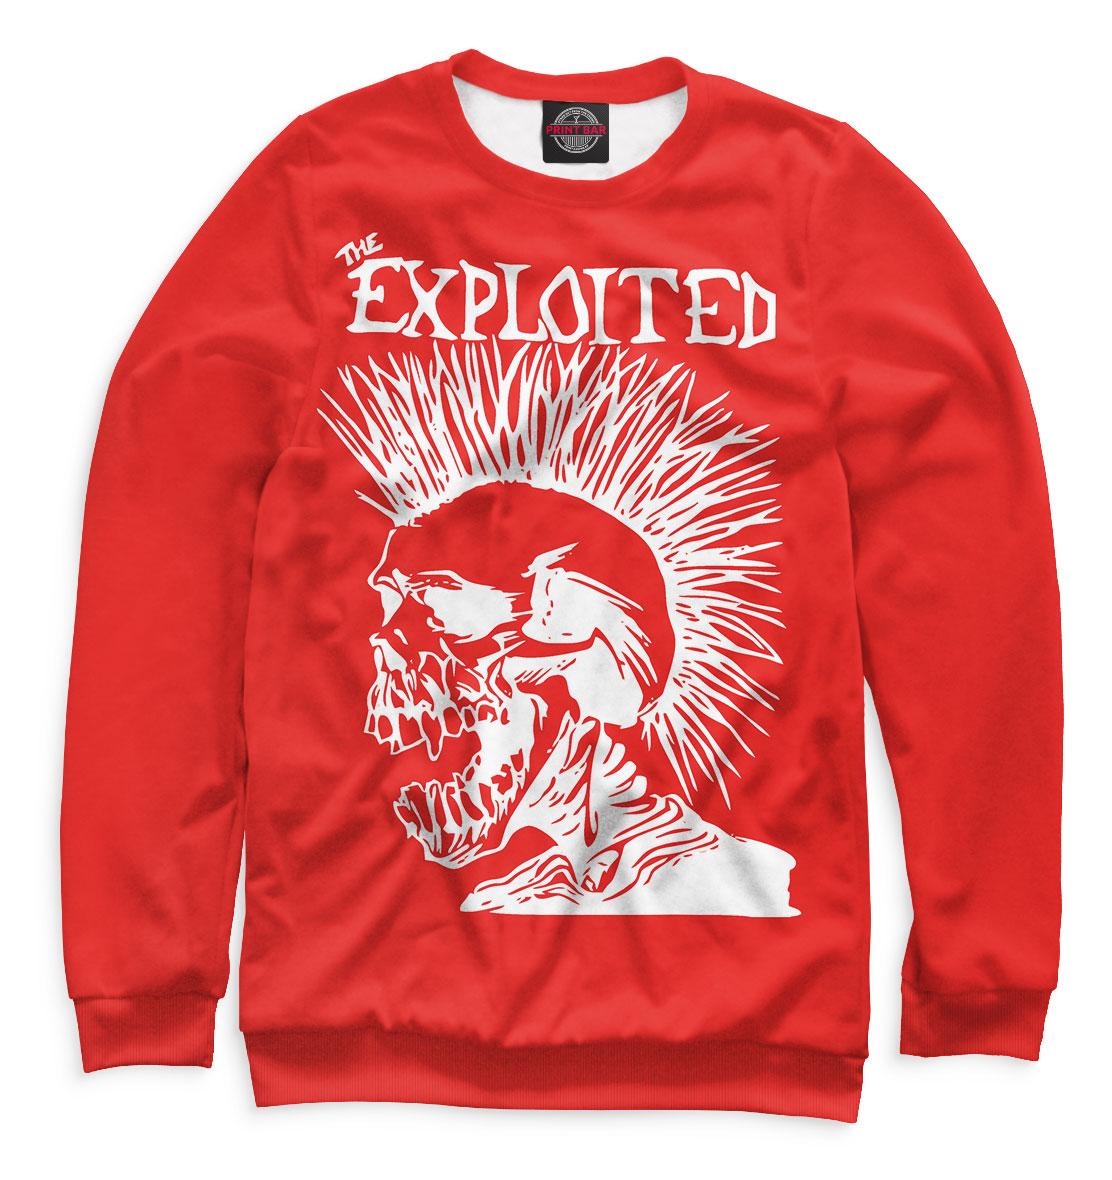 Купить The Exploited, Printbar, Свитшоты, TEX-792633-swi-1